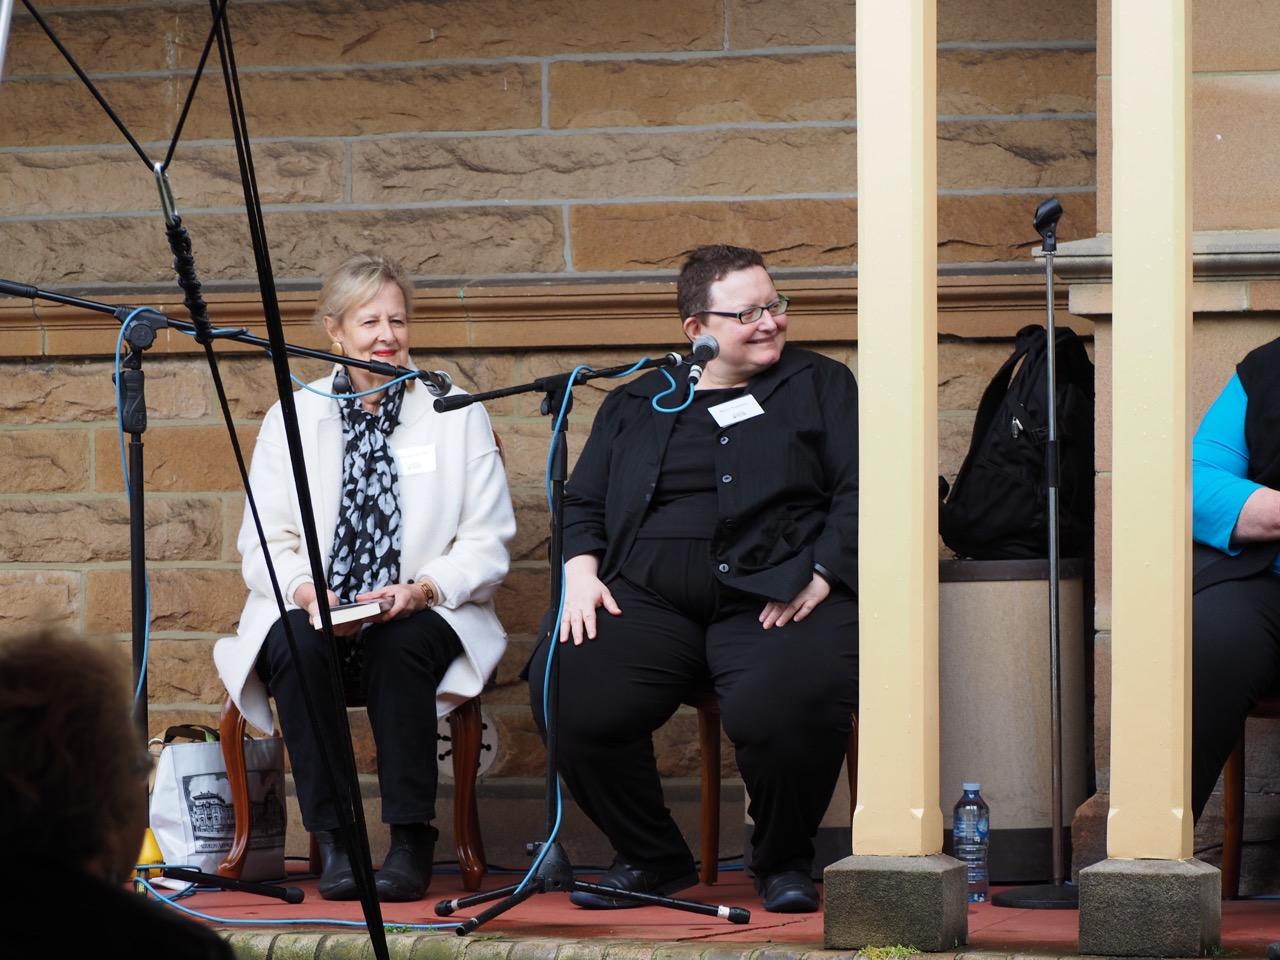 Annabel Morley and Maria Katsonis enjoying their memoir panel. Photo by John Grant.